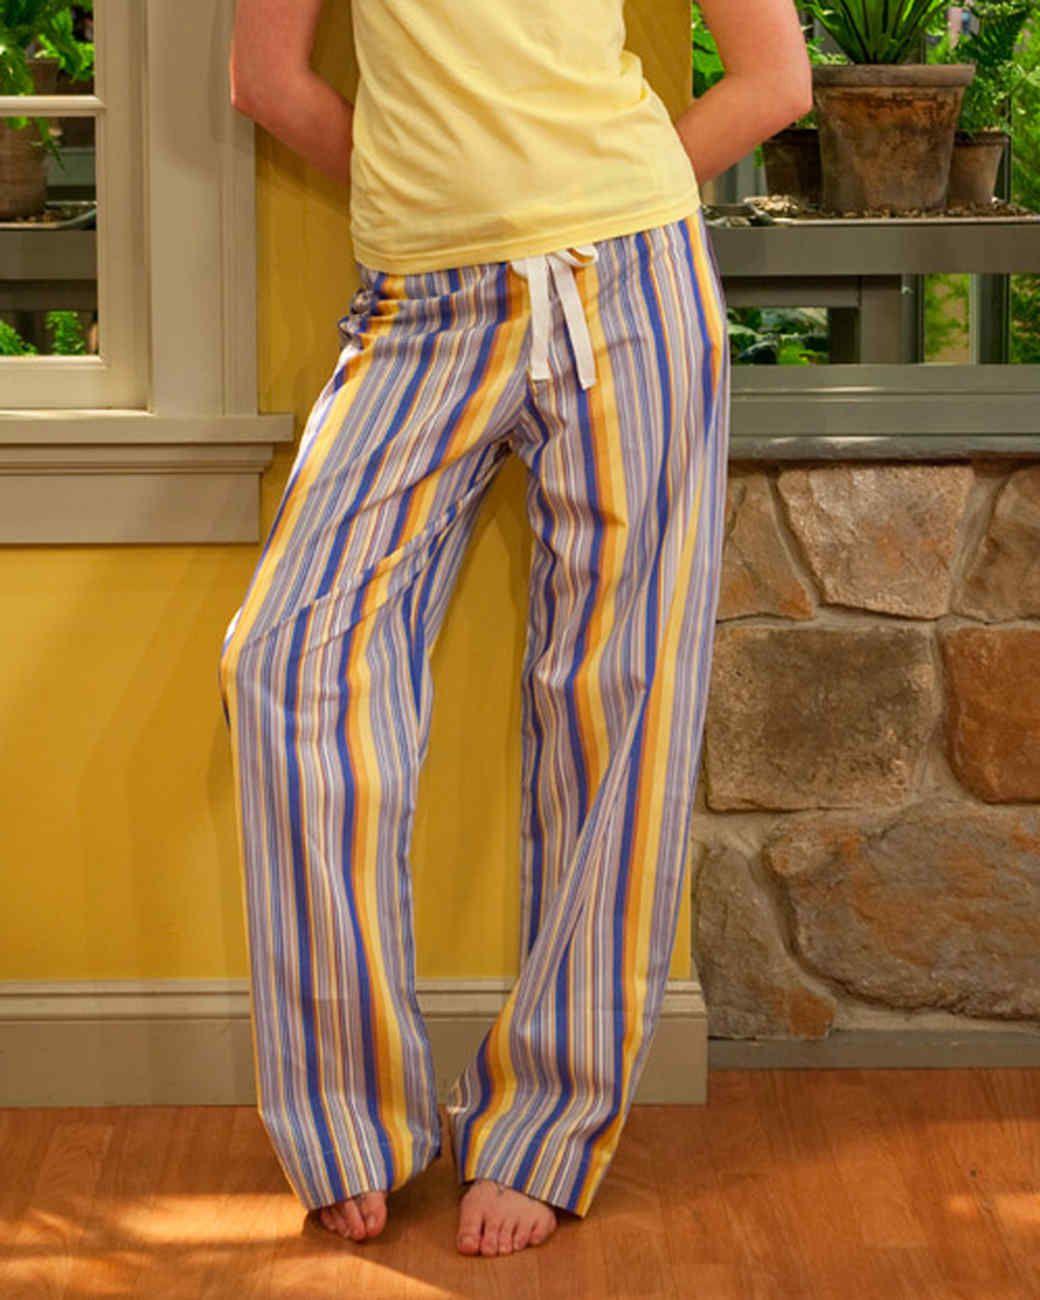 A woman wearing striped drawstring pajama pants